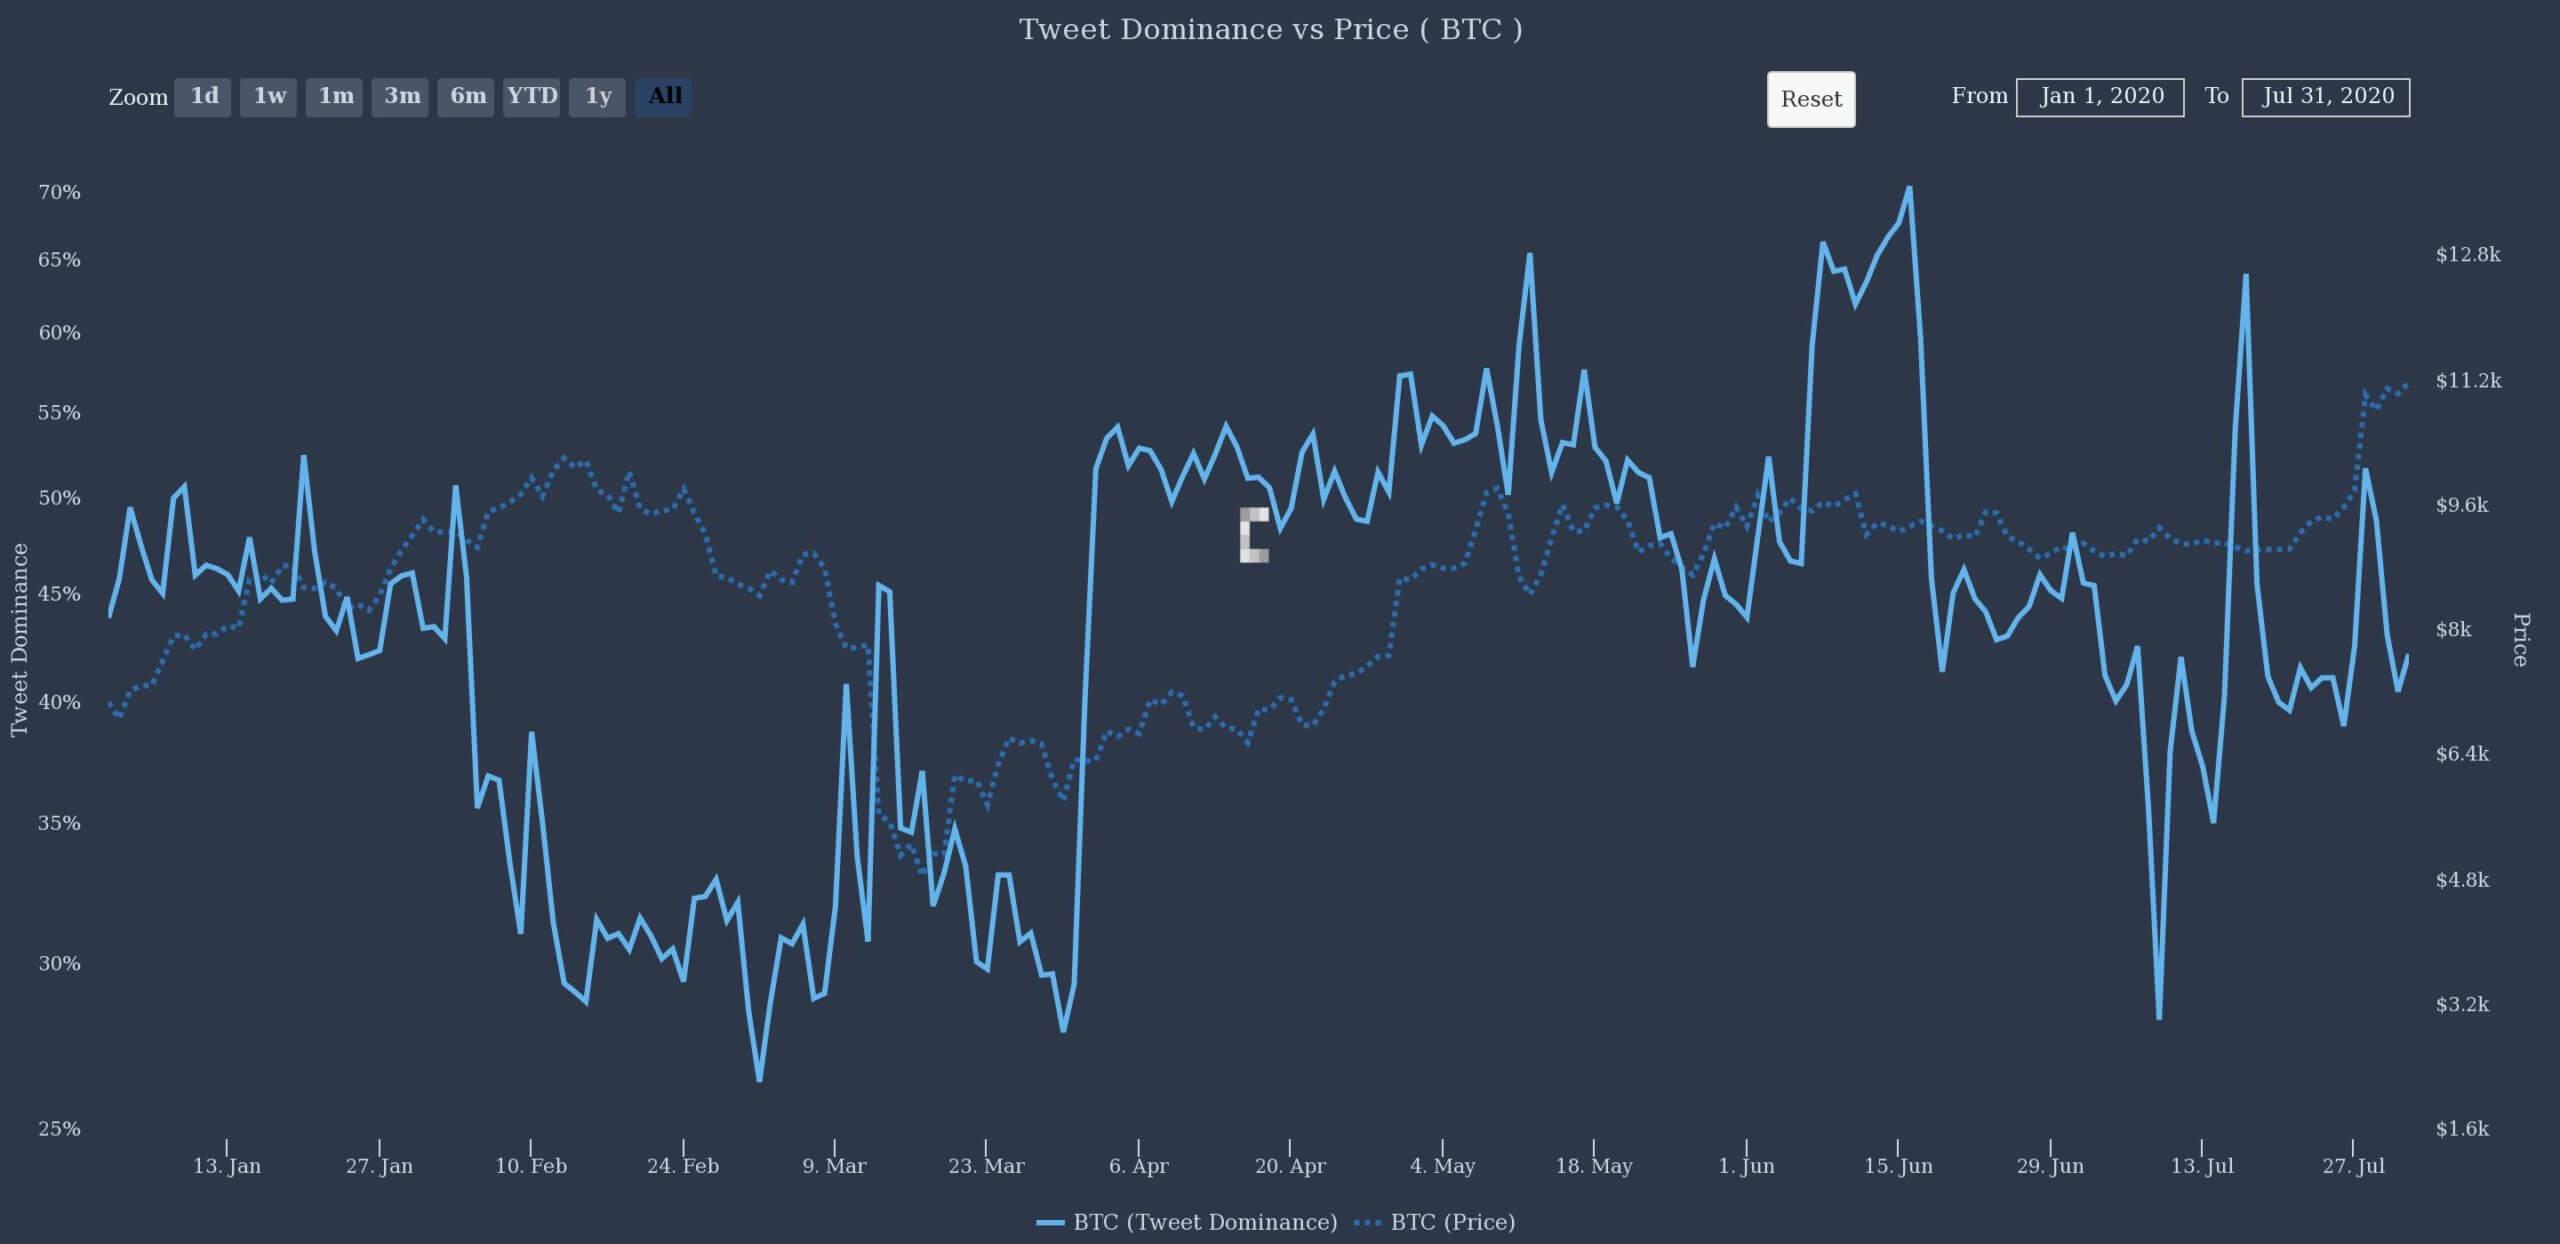 Bitcoin Tweet Dominance